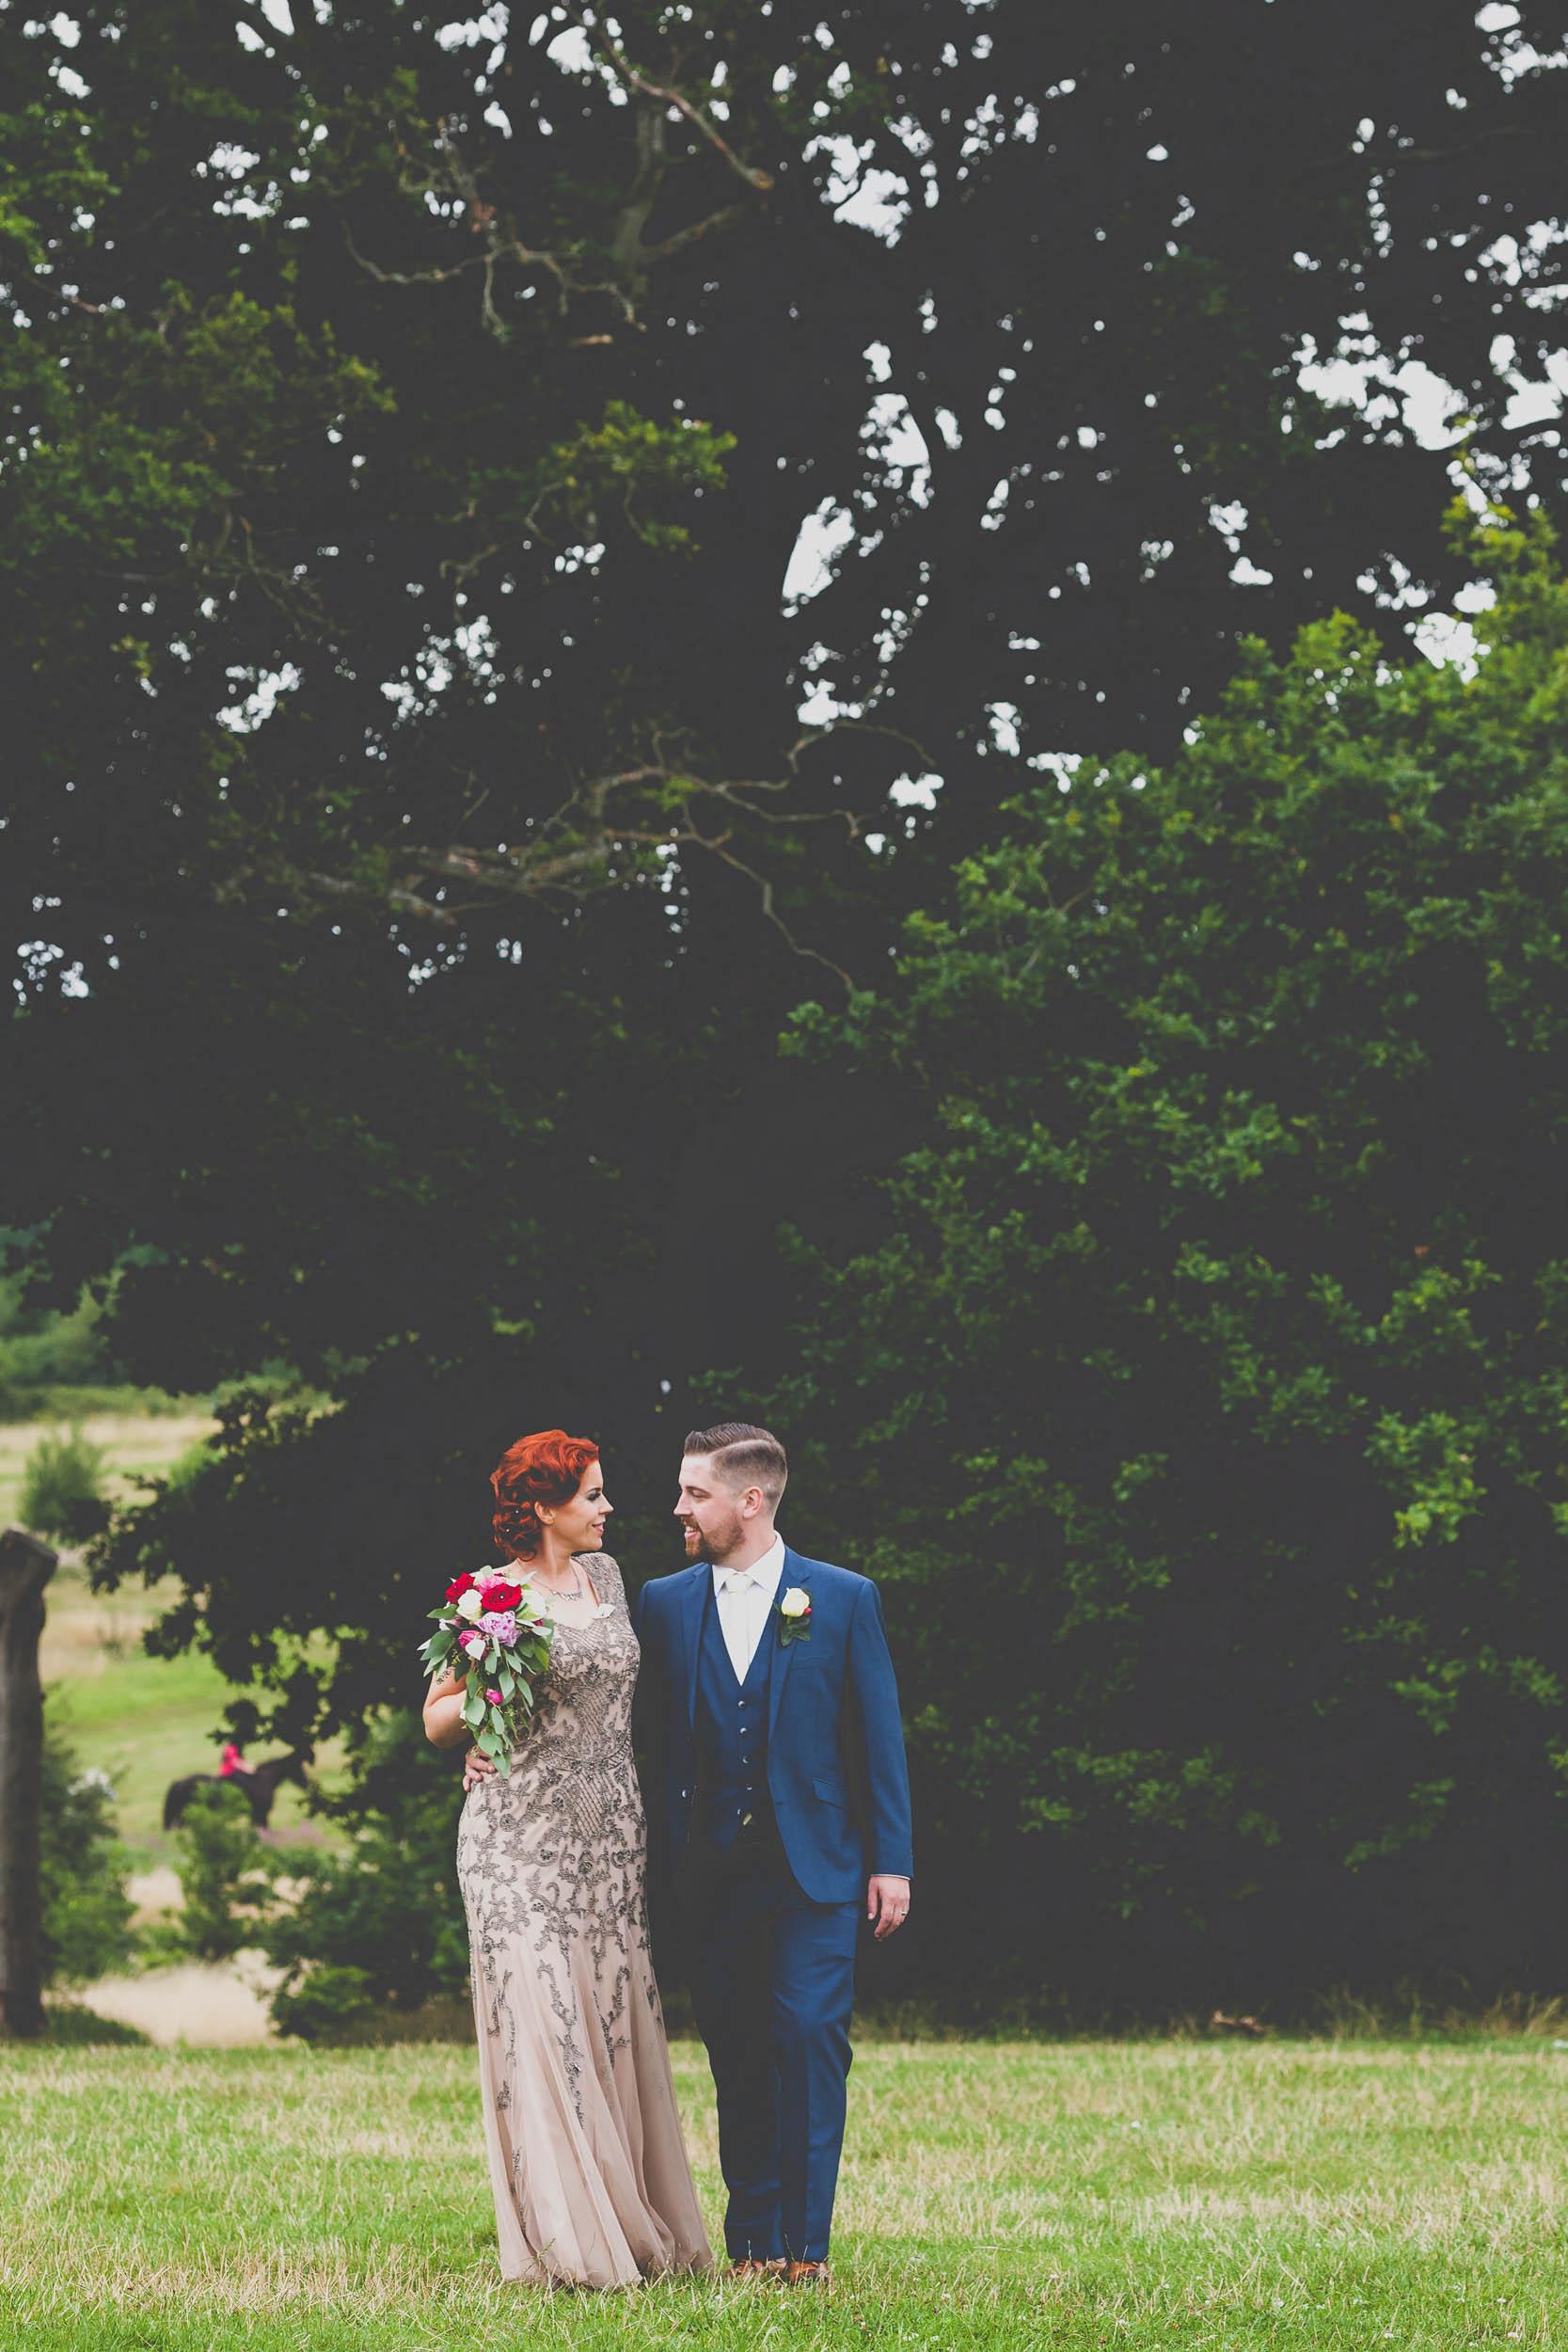 queen-elizabeths-hunting-lodge-epping-forest-wedding191.jpg